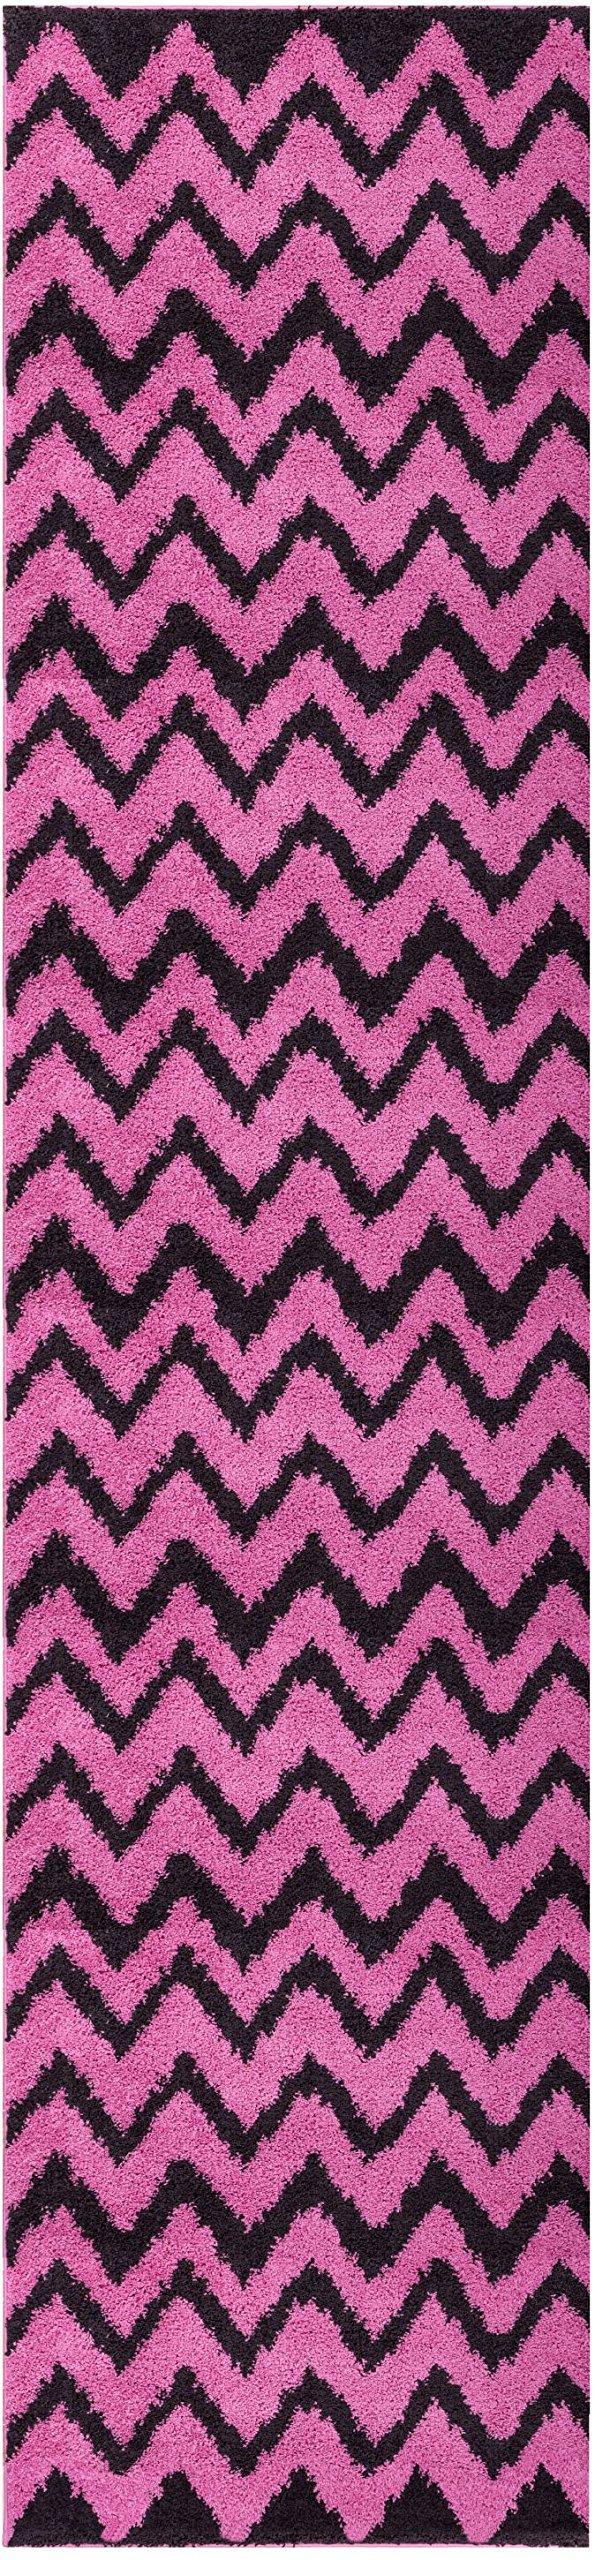 Well Woven Runner Rug Madison Shag Passion Chevron Zig Zag Fuchsia Pink Modern 20'' X 7'2'' Flokati Soft Plush Thick Rug 7057